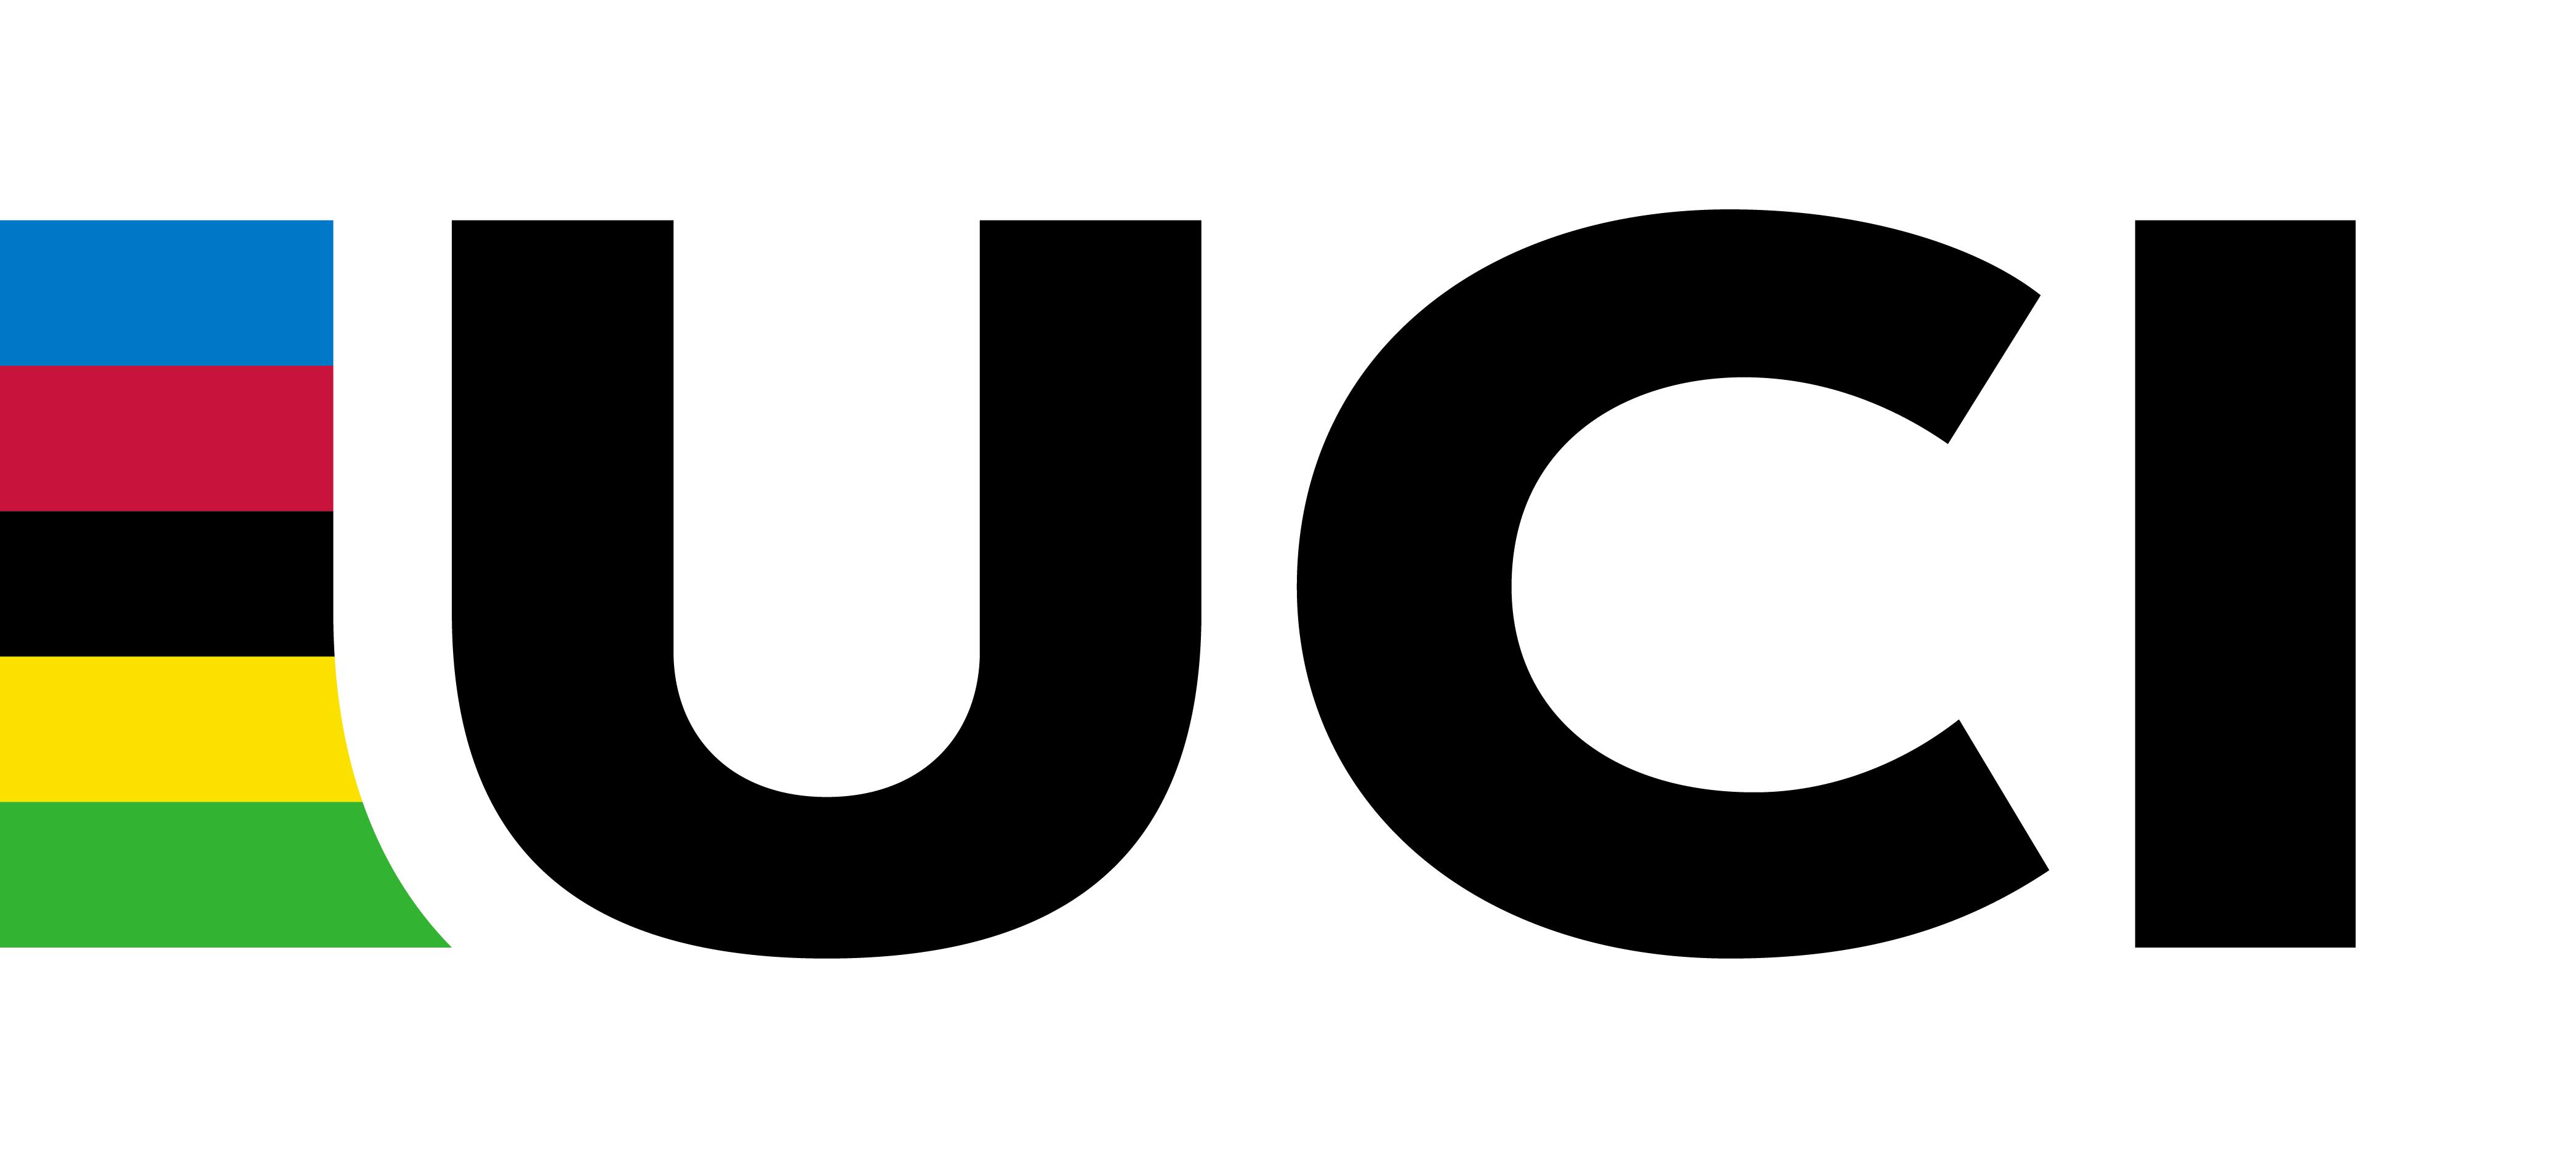 International Cyclist Union